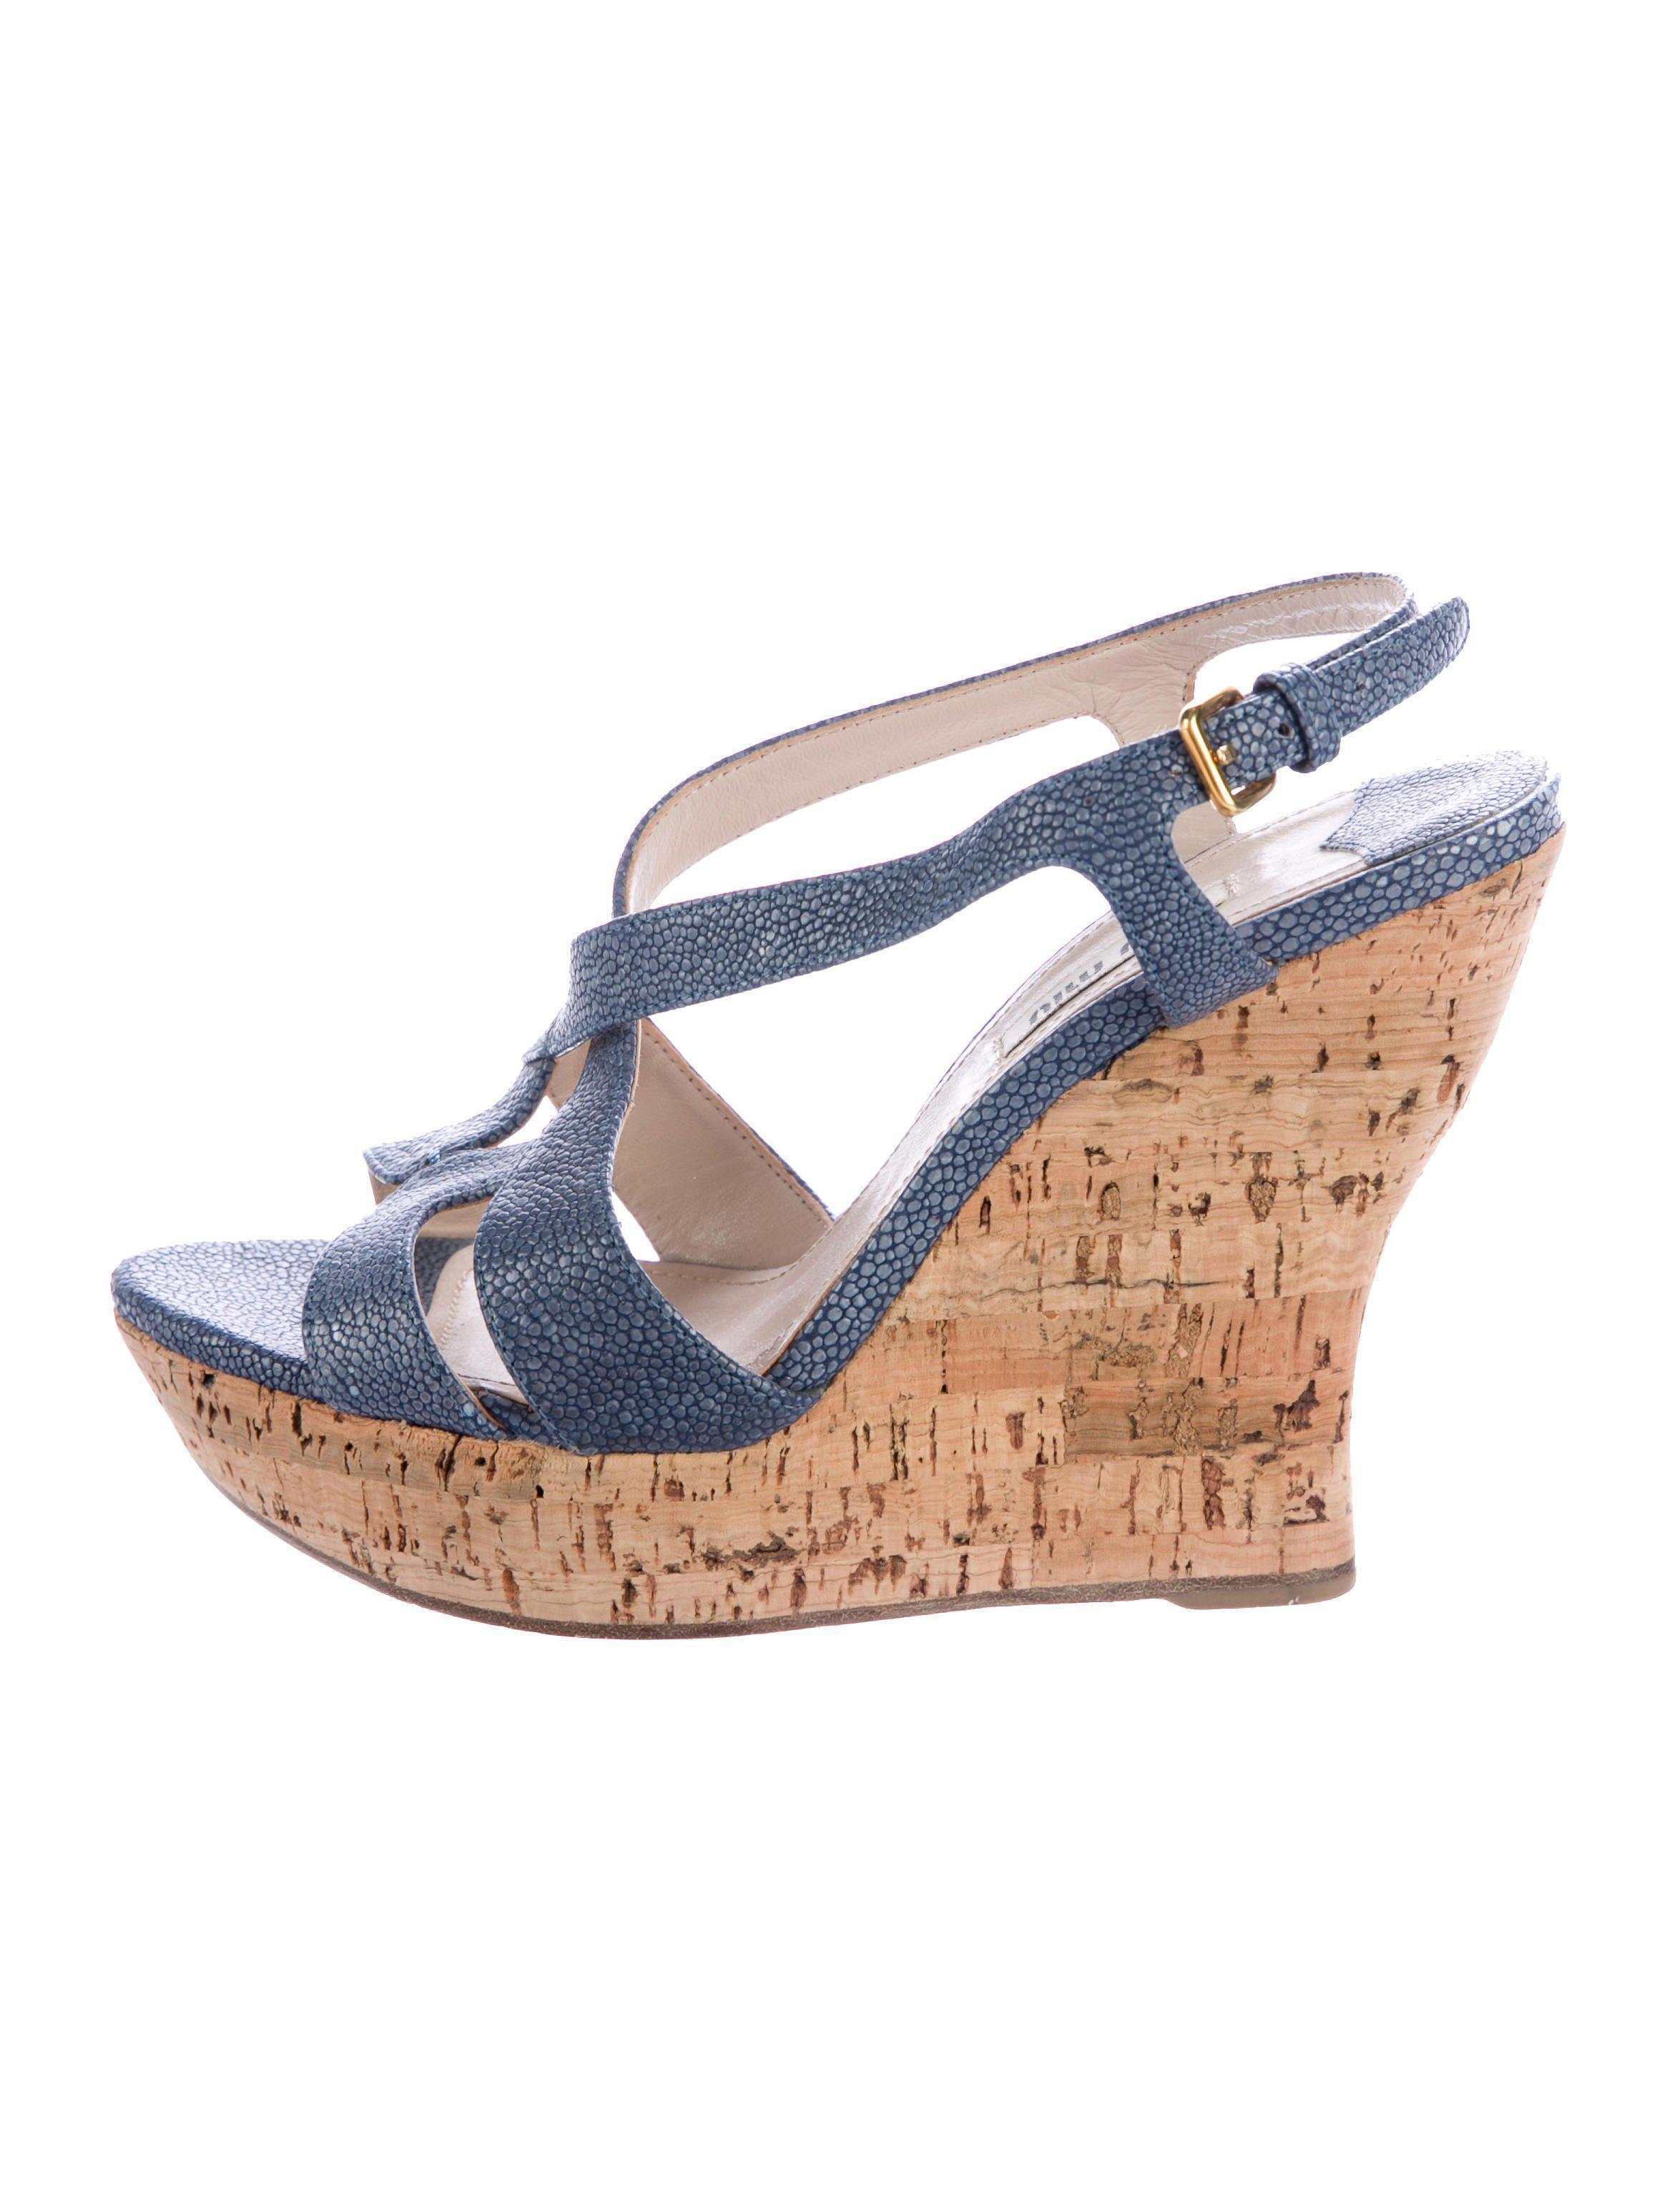 Miu Miu Embossed Wedge Sandals buy cheap many kinds of 3R1qTgCYe